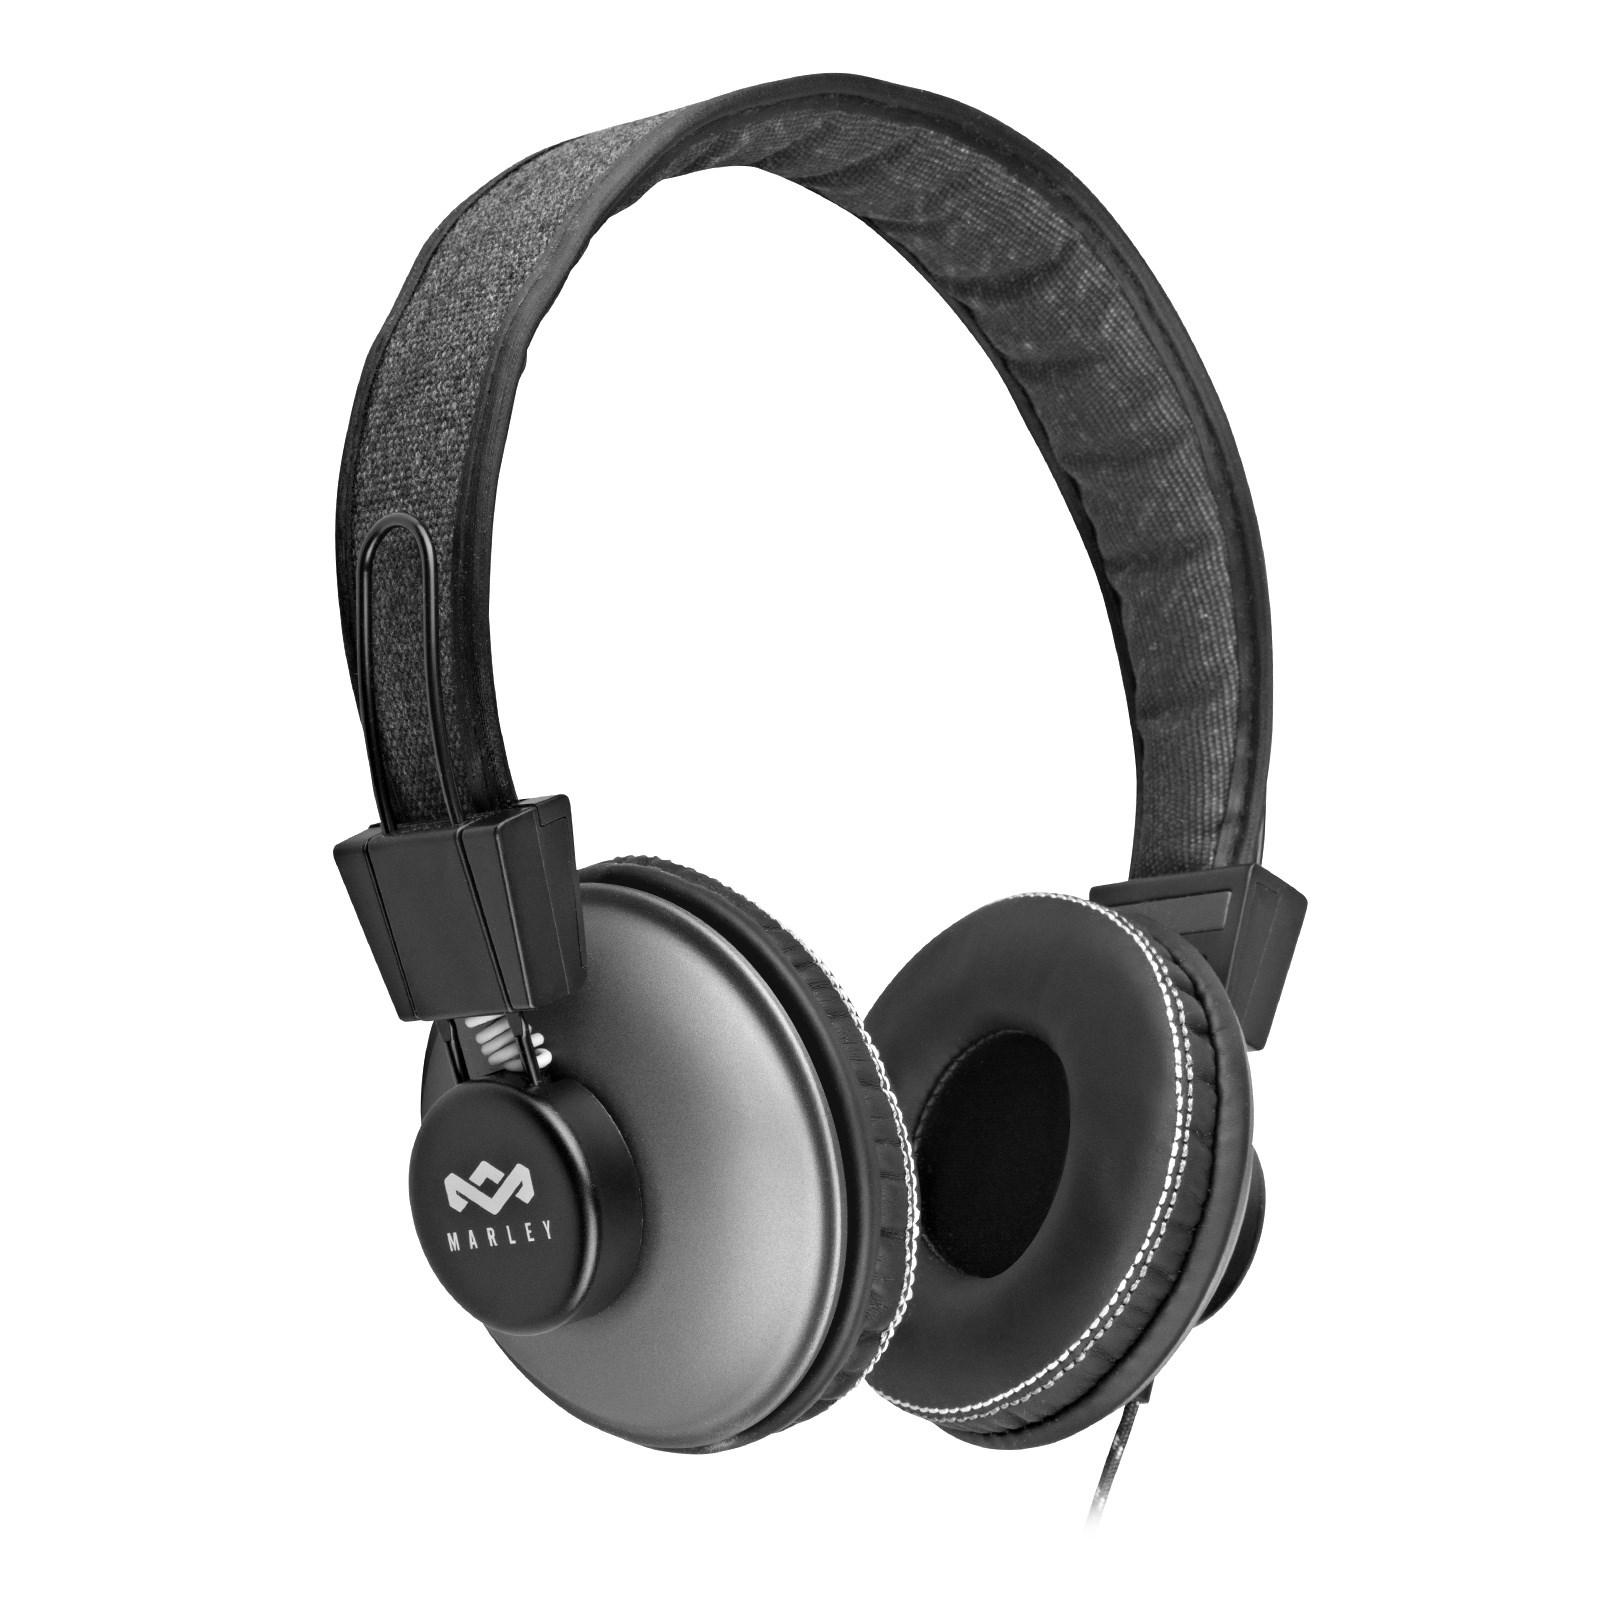 House of MarleyPositive Vibration On-Ear Headphones (Black) MAR-EM-JH013-PS-A2